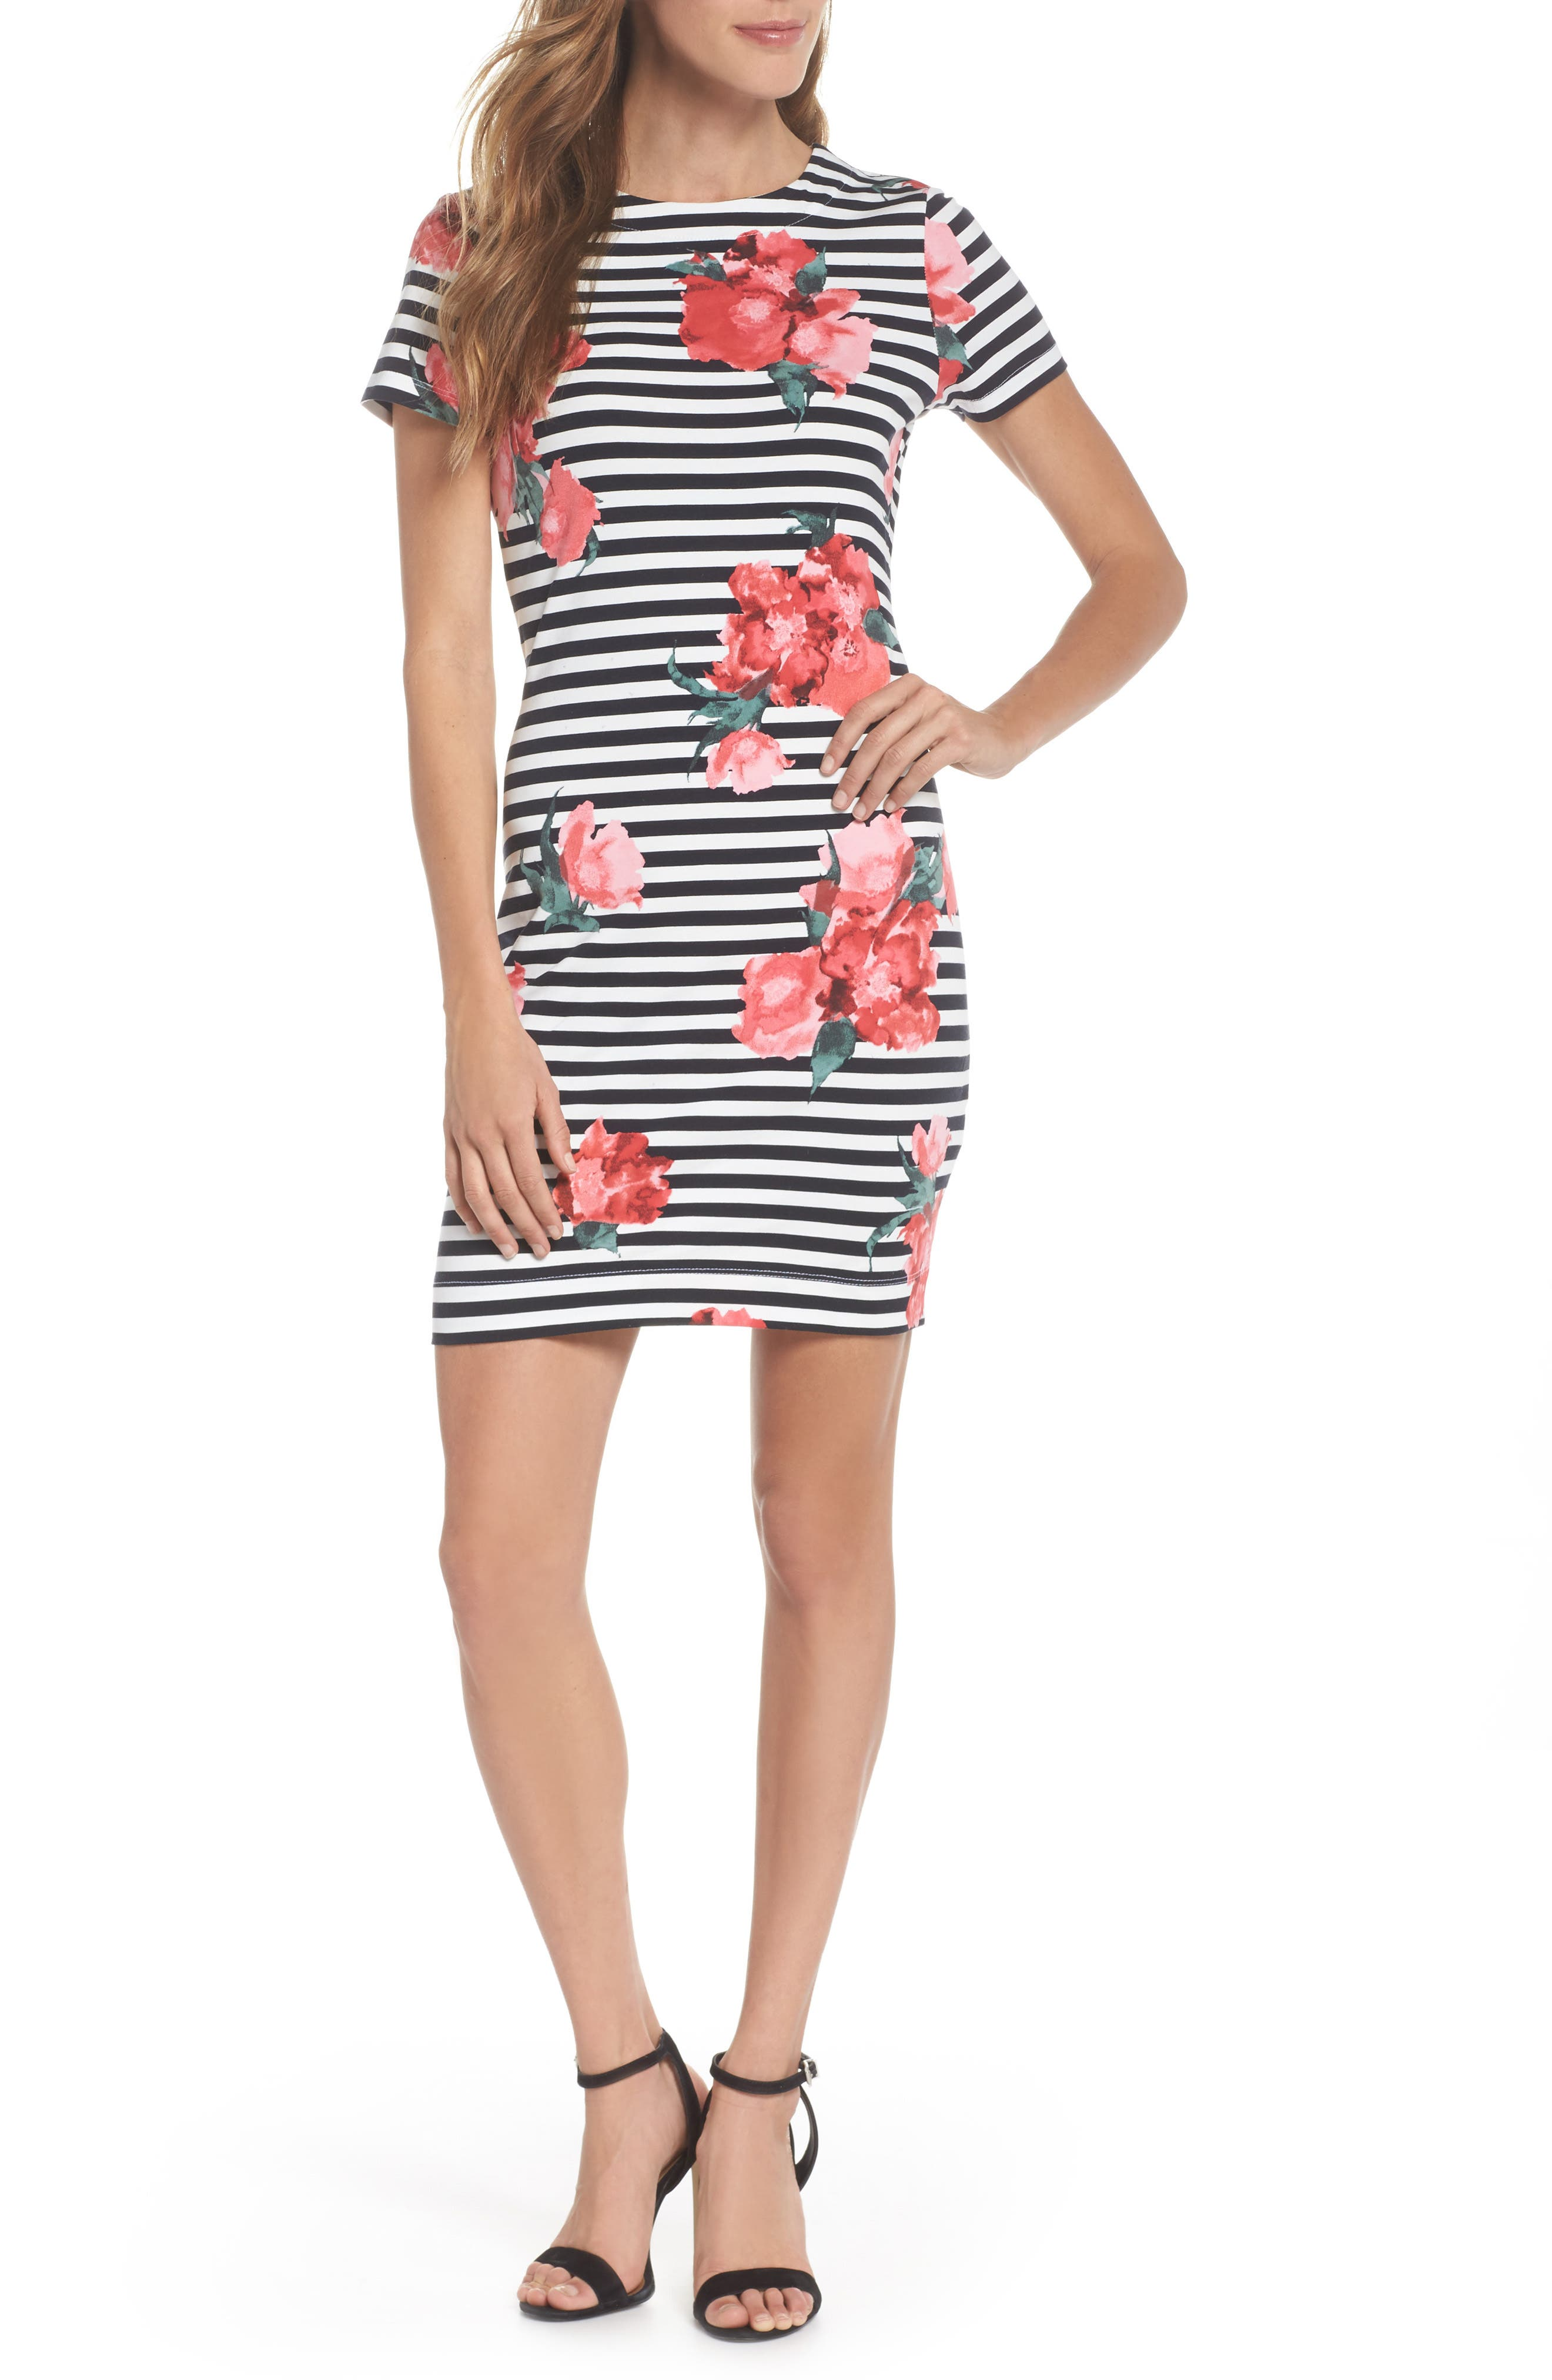 Jude Flower Stripe Knit Dress,                             Main thumbnail 1, color,                             Nocturnal Multi